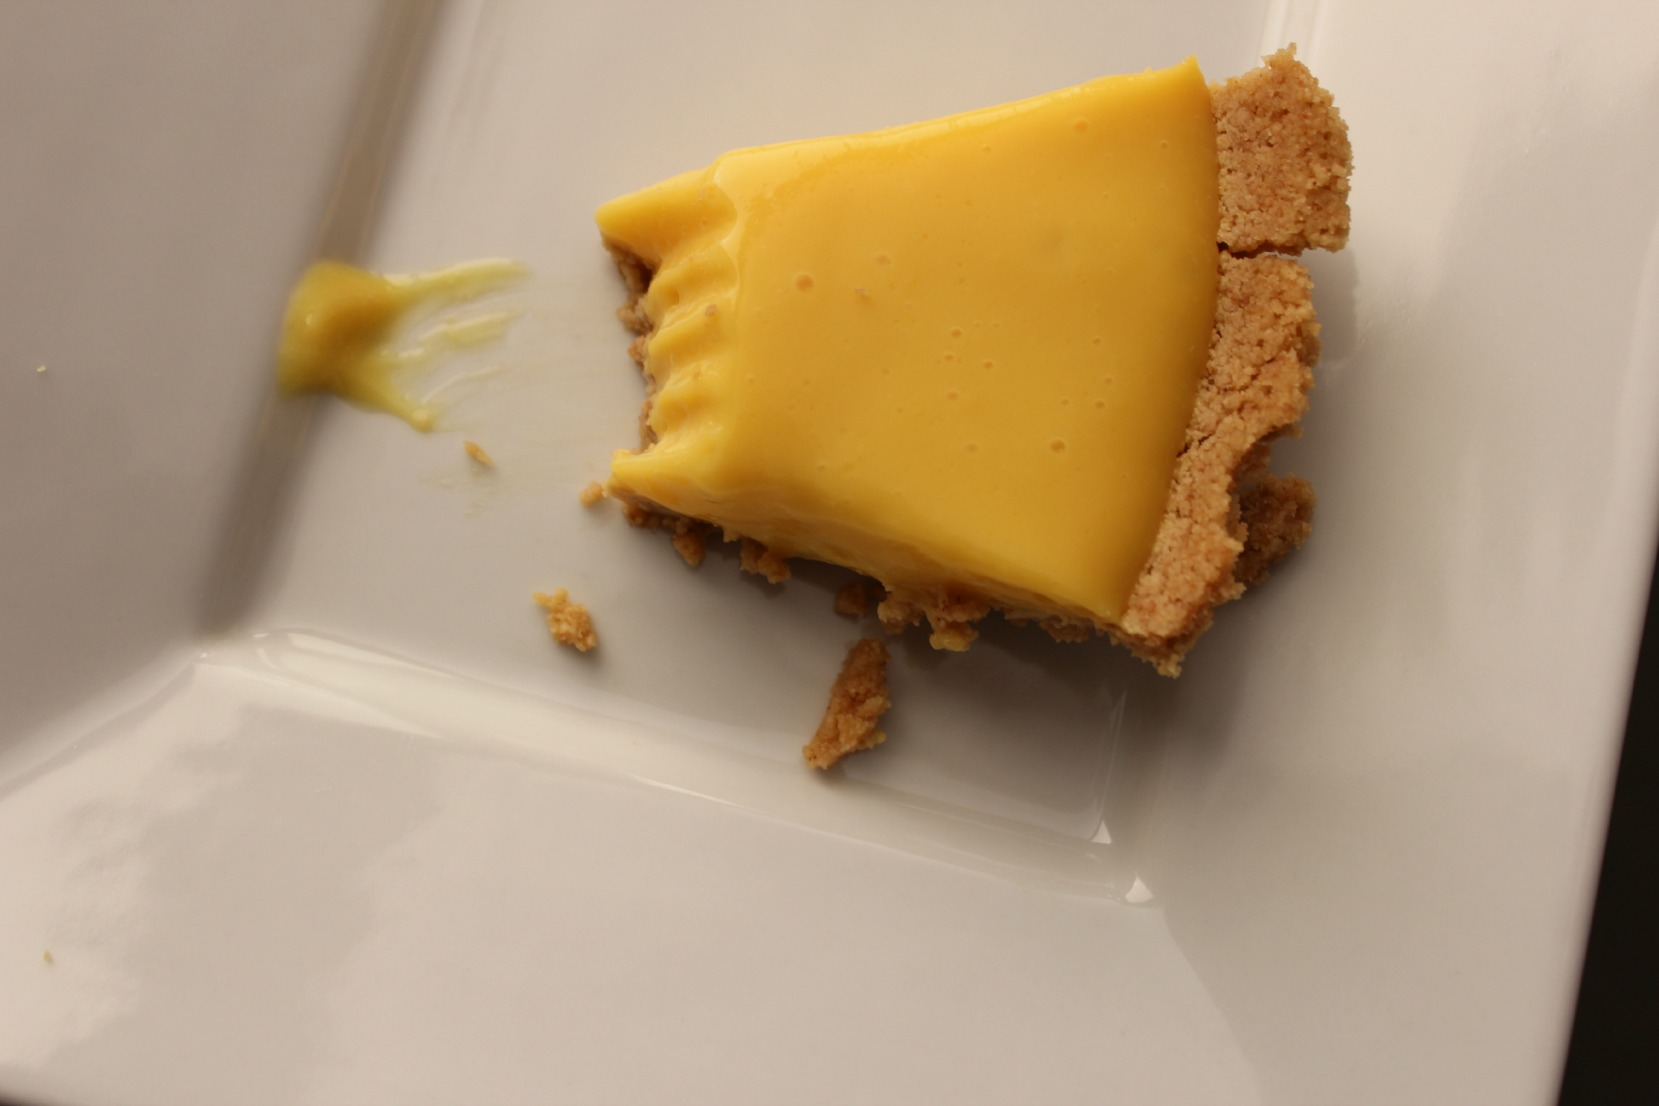 Gnc Cake Bites